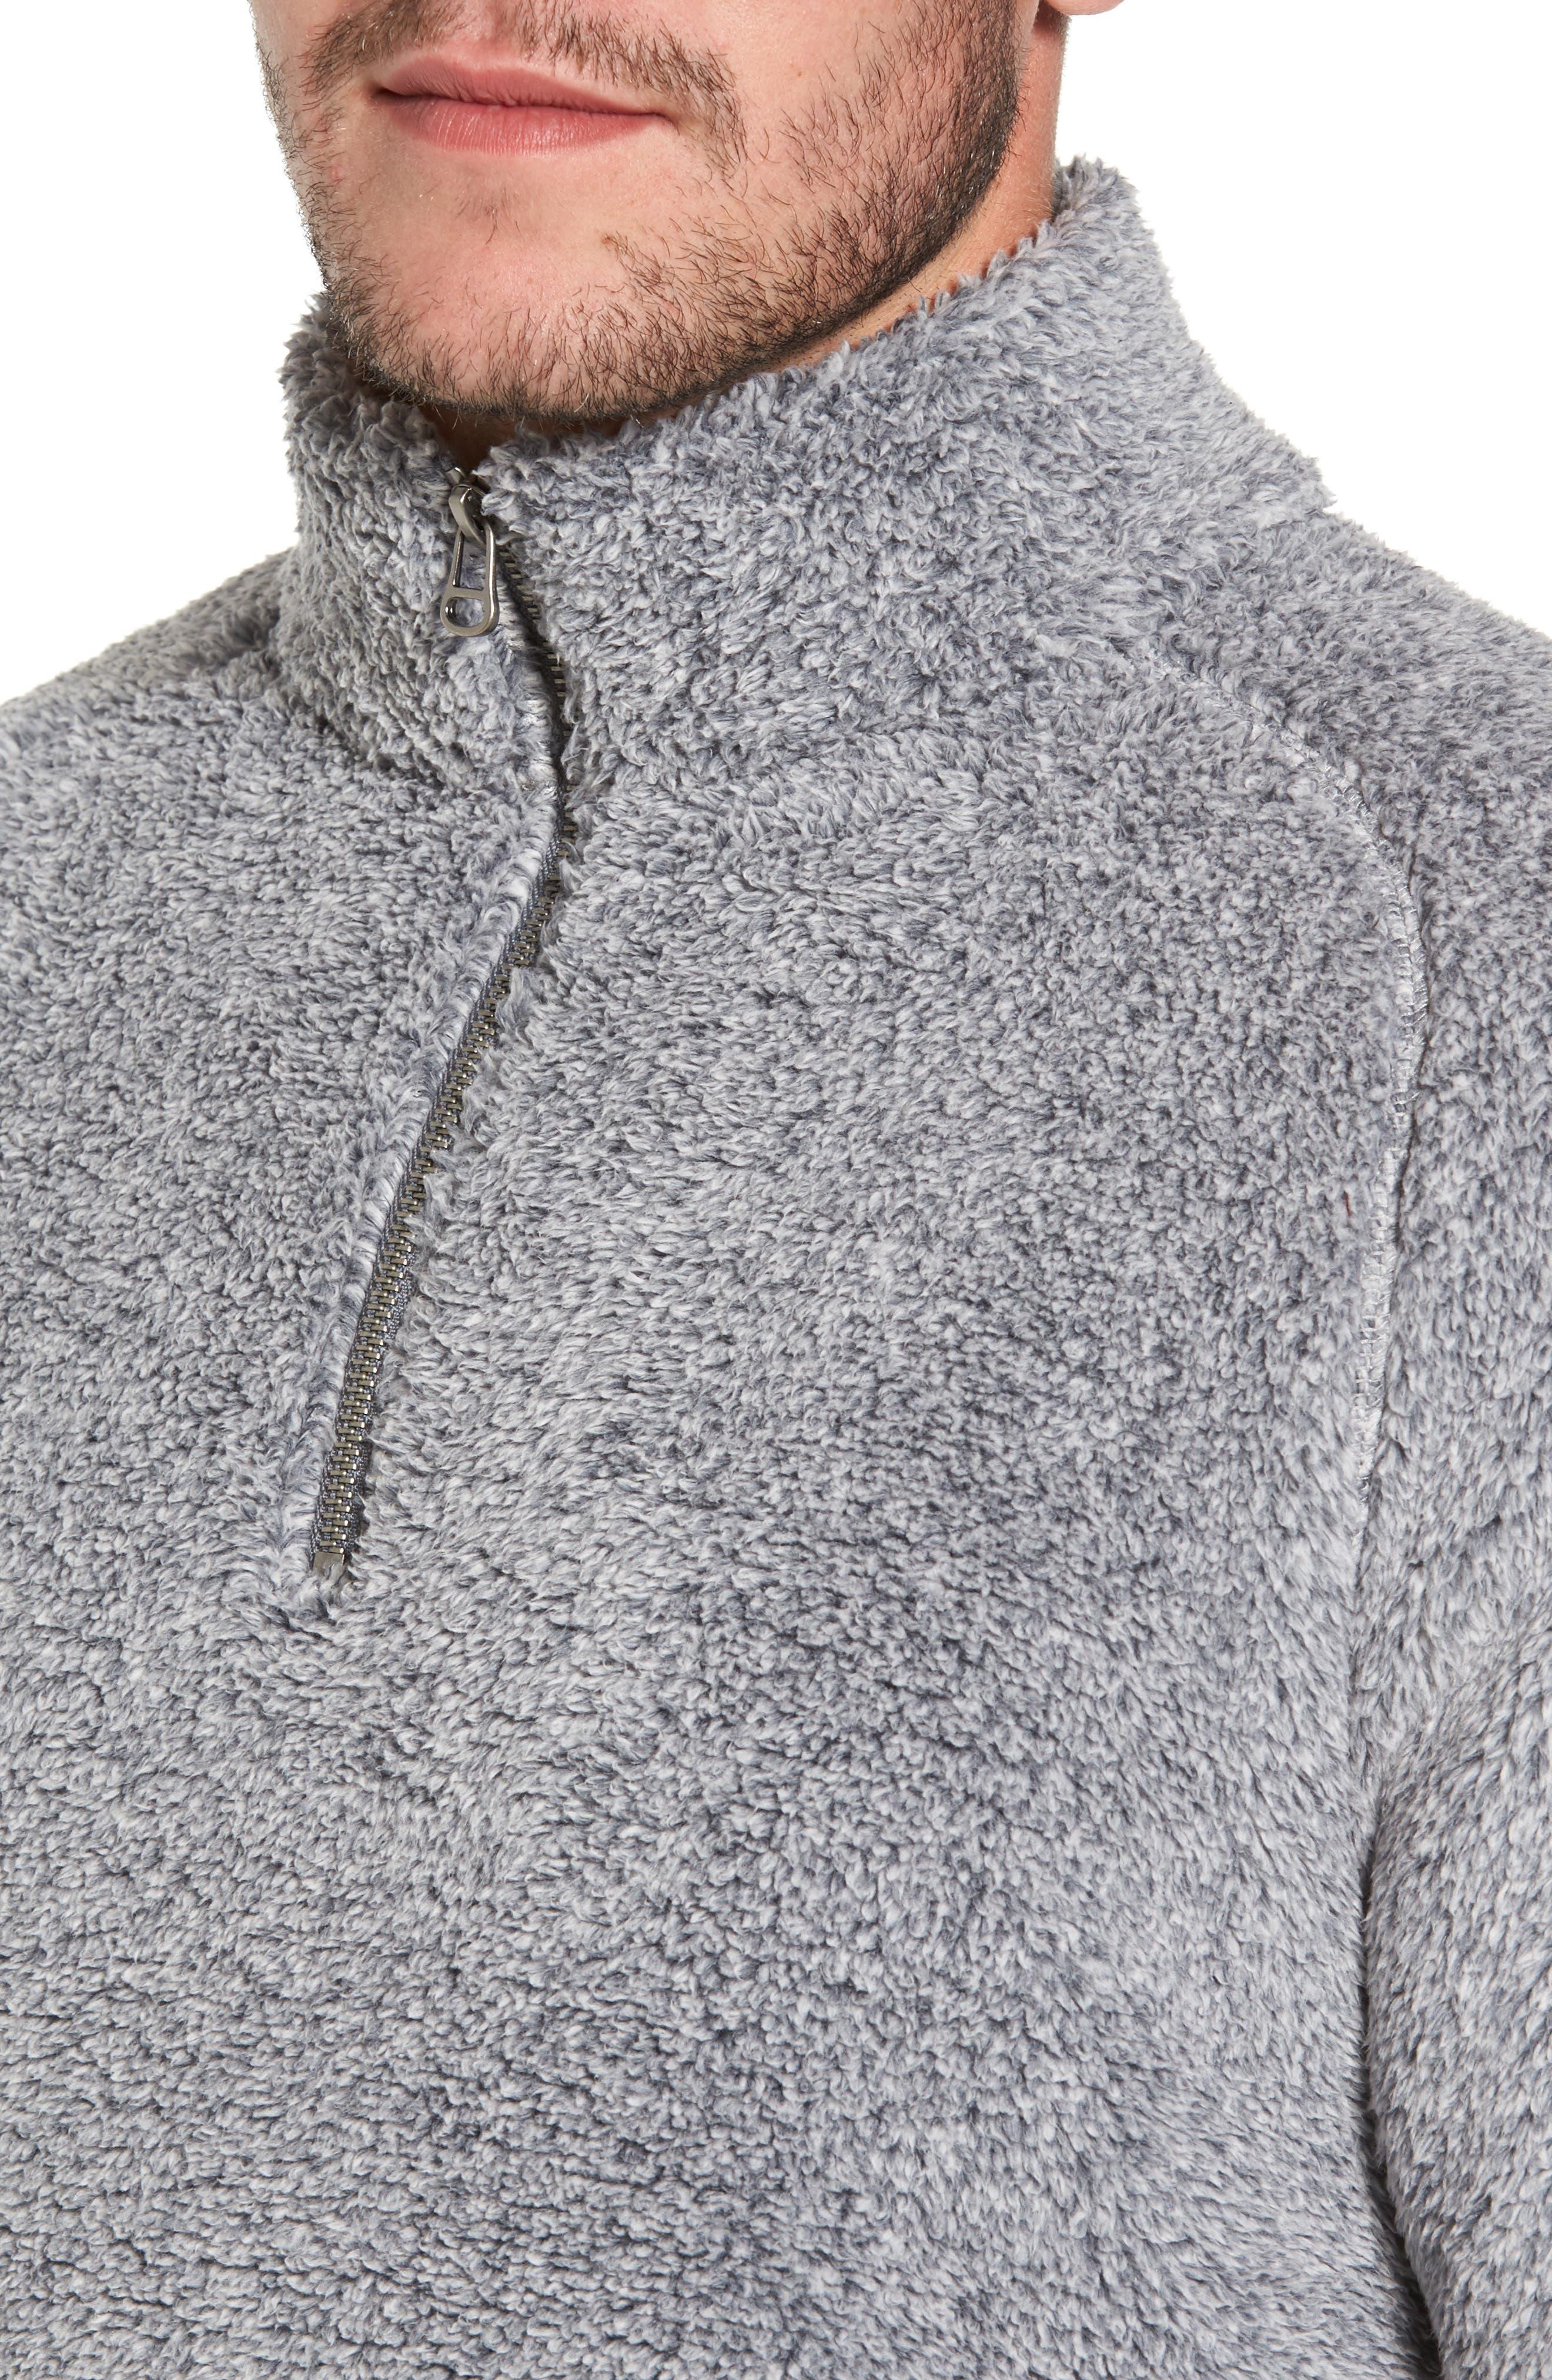 Polar Fleece Quarter Zip Pullover,                             Alternate thumbnail 4, color,                             Black Caviar Heather